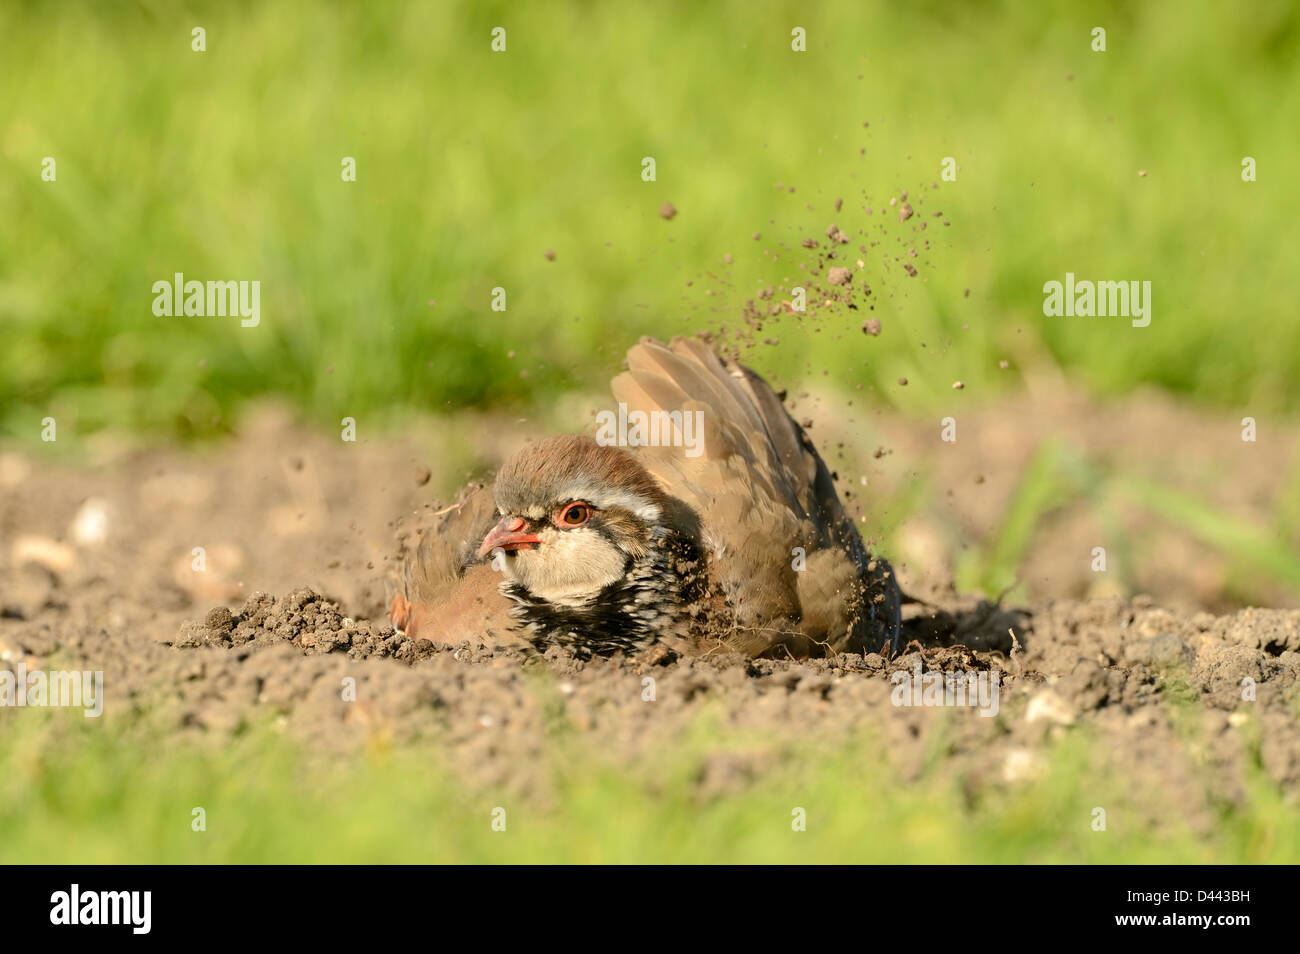 Rothuhn (Alectoris Rufa) saß am Boden, Staub baden, Oxfordshire, England, September Stockbild